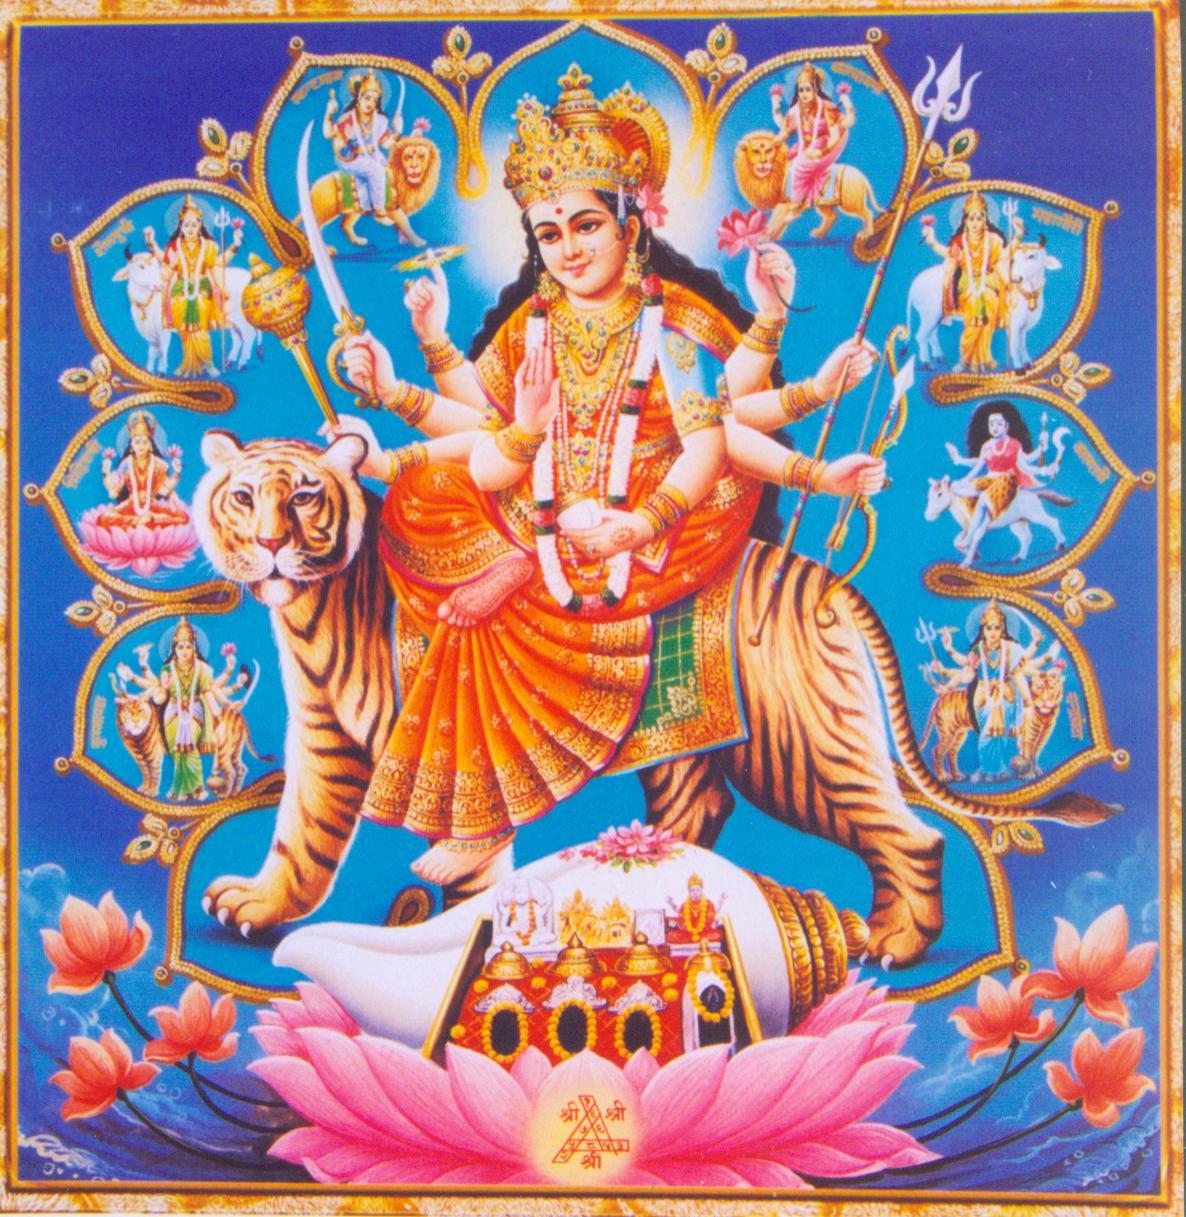 Lord Ganesha 3d Wallpapers Free Download Hindu God Wallpapers Hindu Goddess Durga Wallpapers